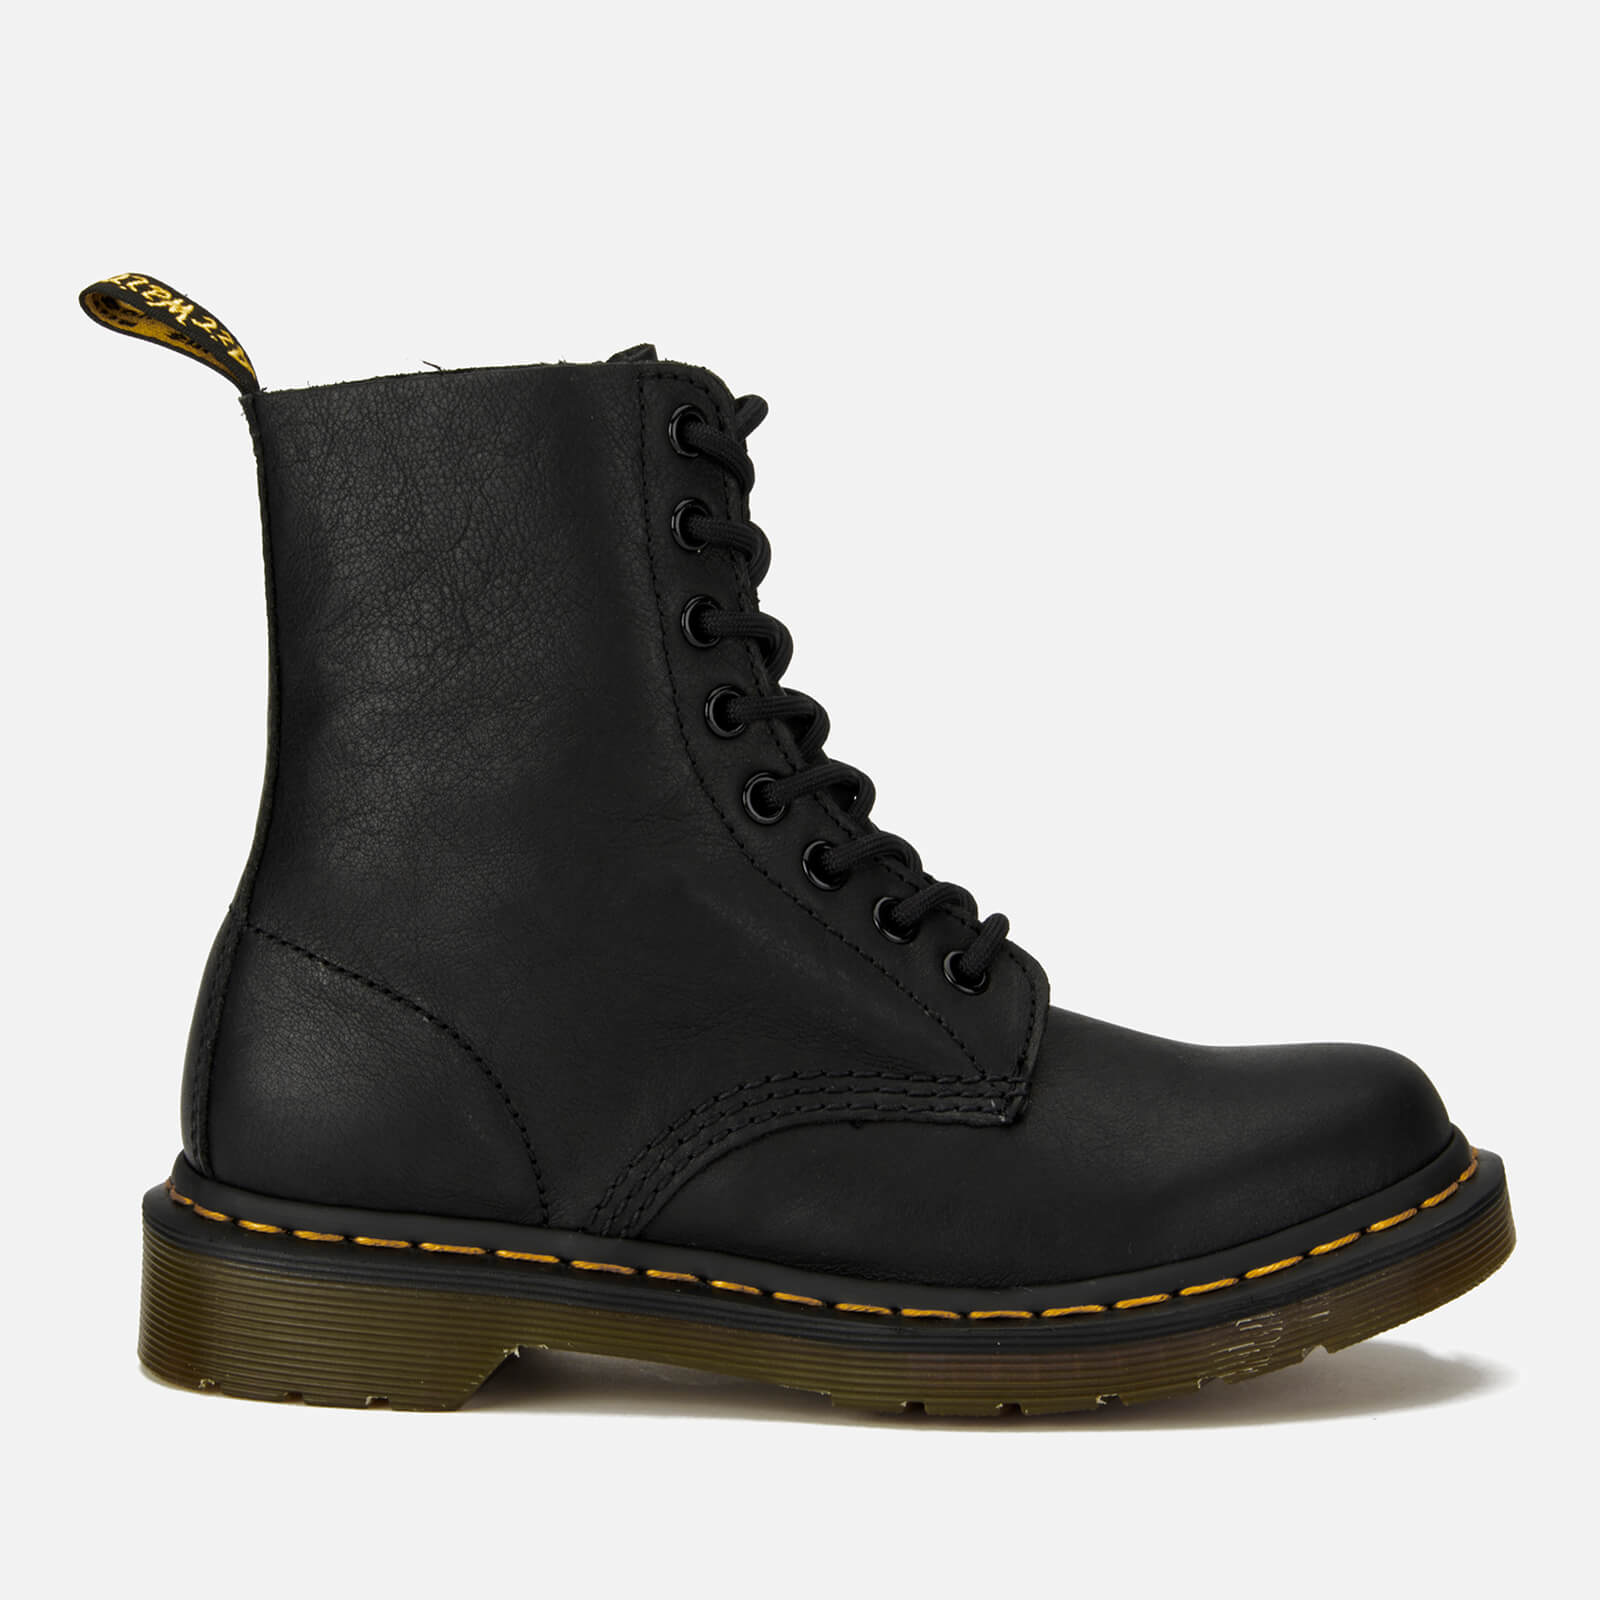 Dr. Martens Women's 1460 Pascal Virginia Leather 8-Eye Boots - Black - Uk 8 - Black